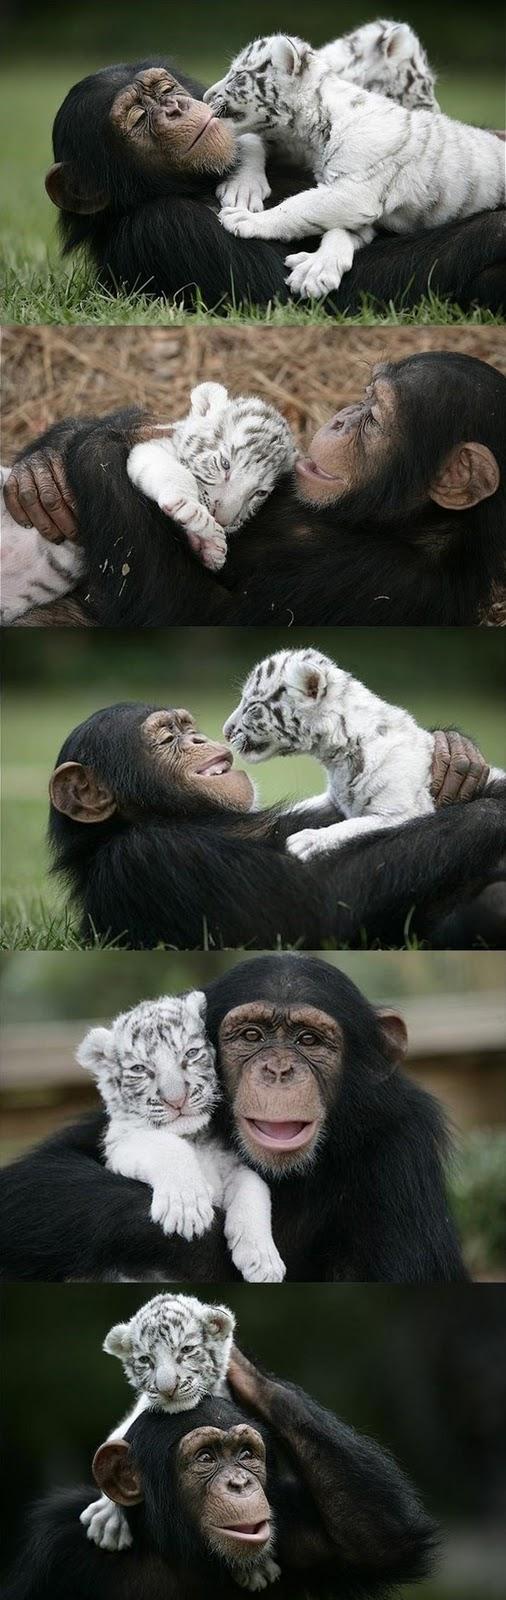 monyet dan harimau